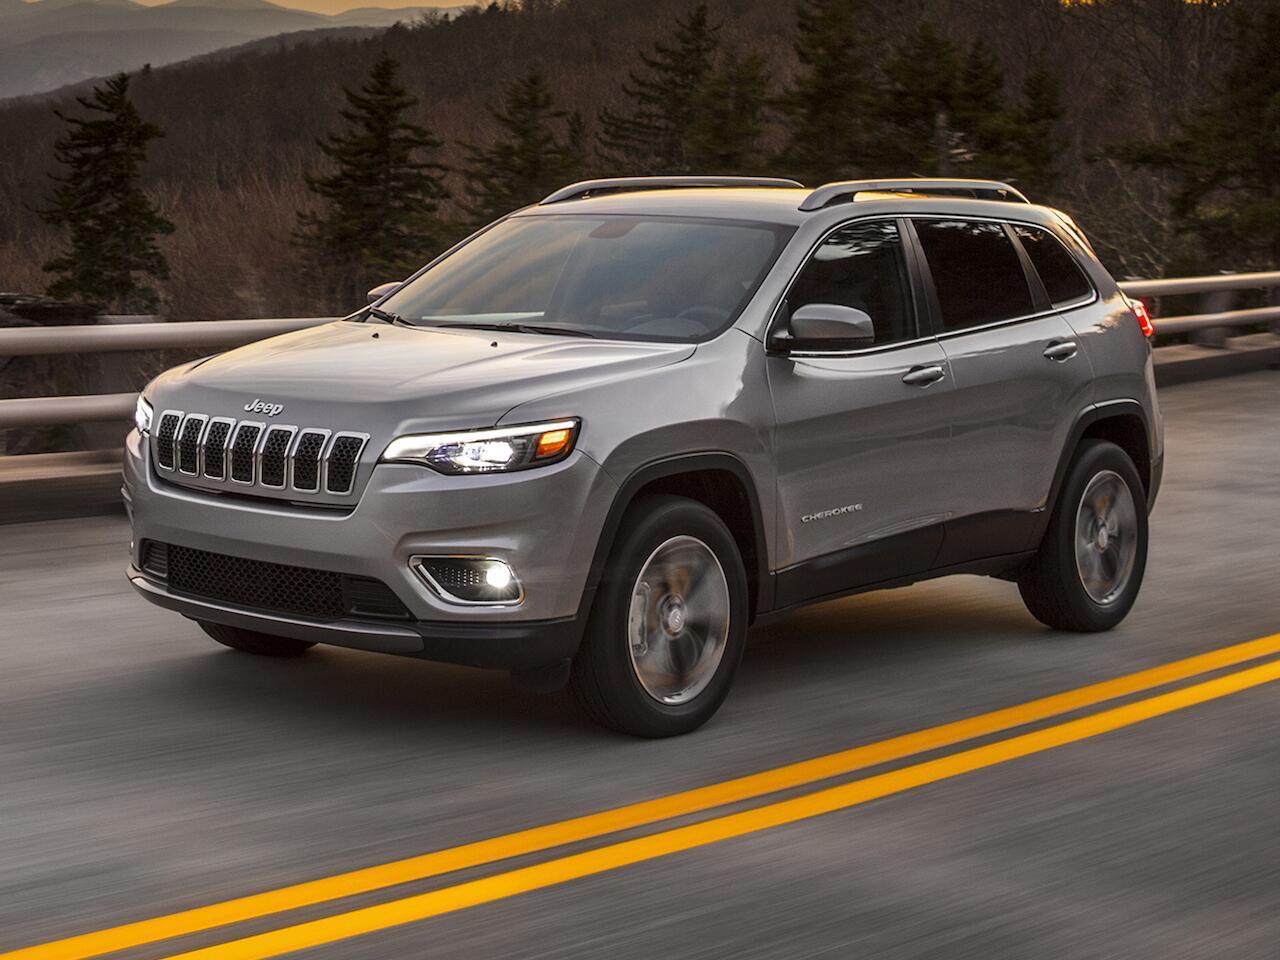 Bild zu Jeep Cherokee Facelift 2018